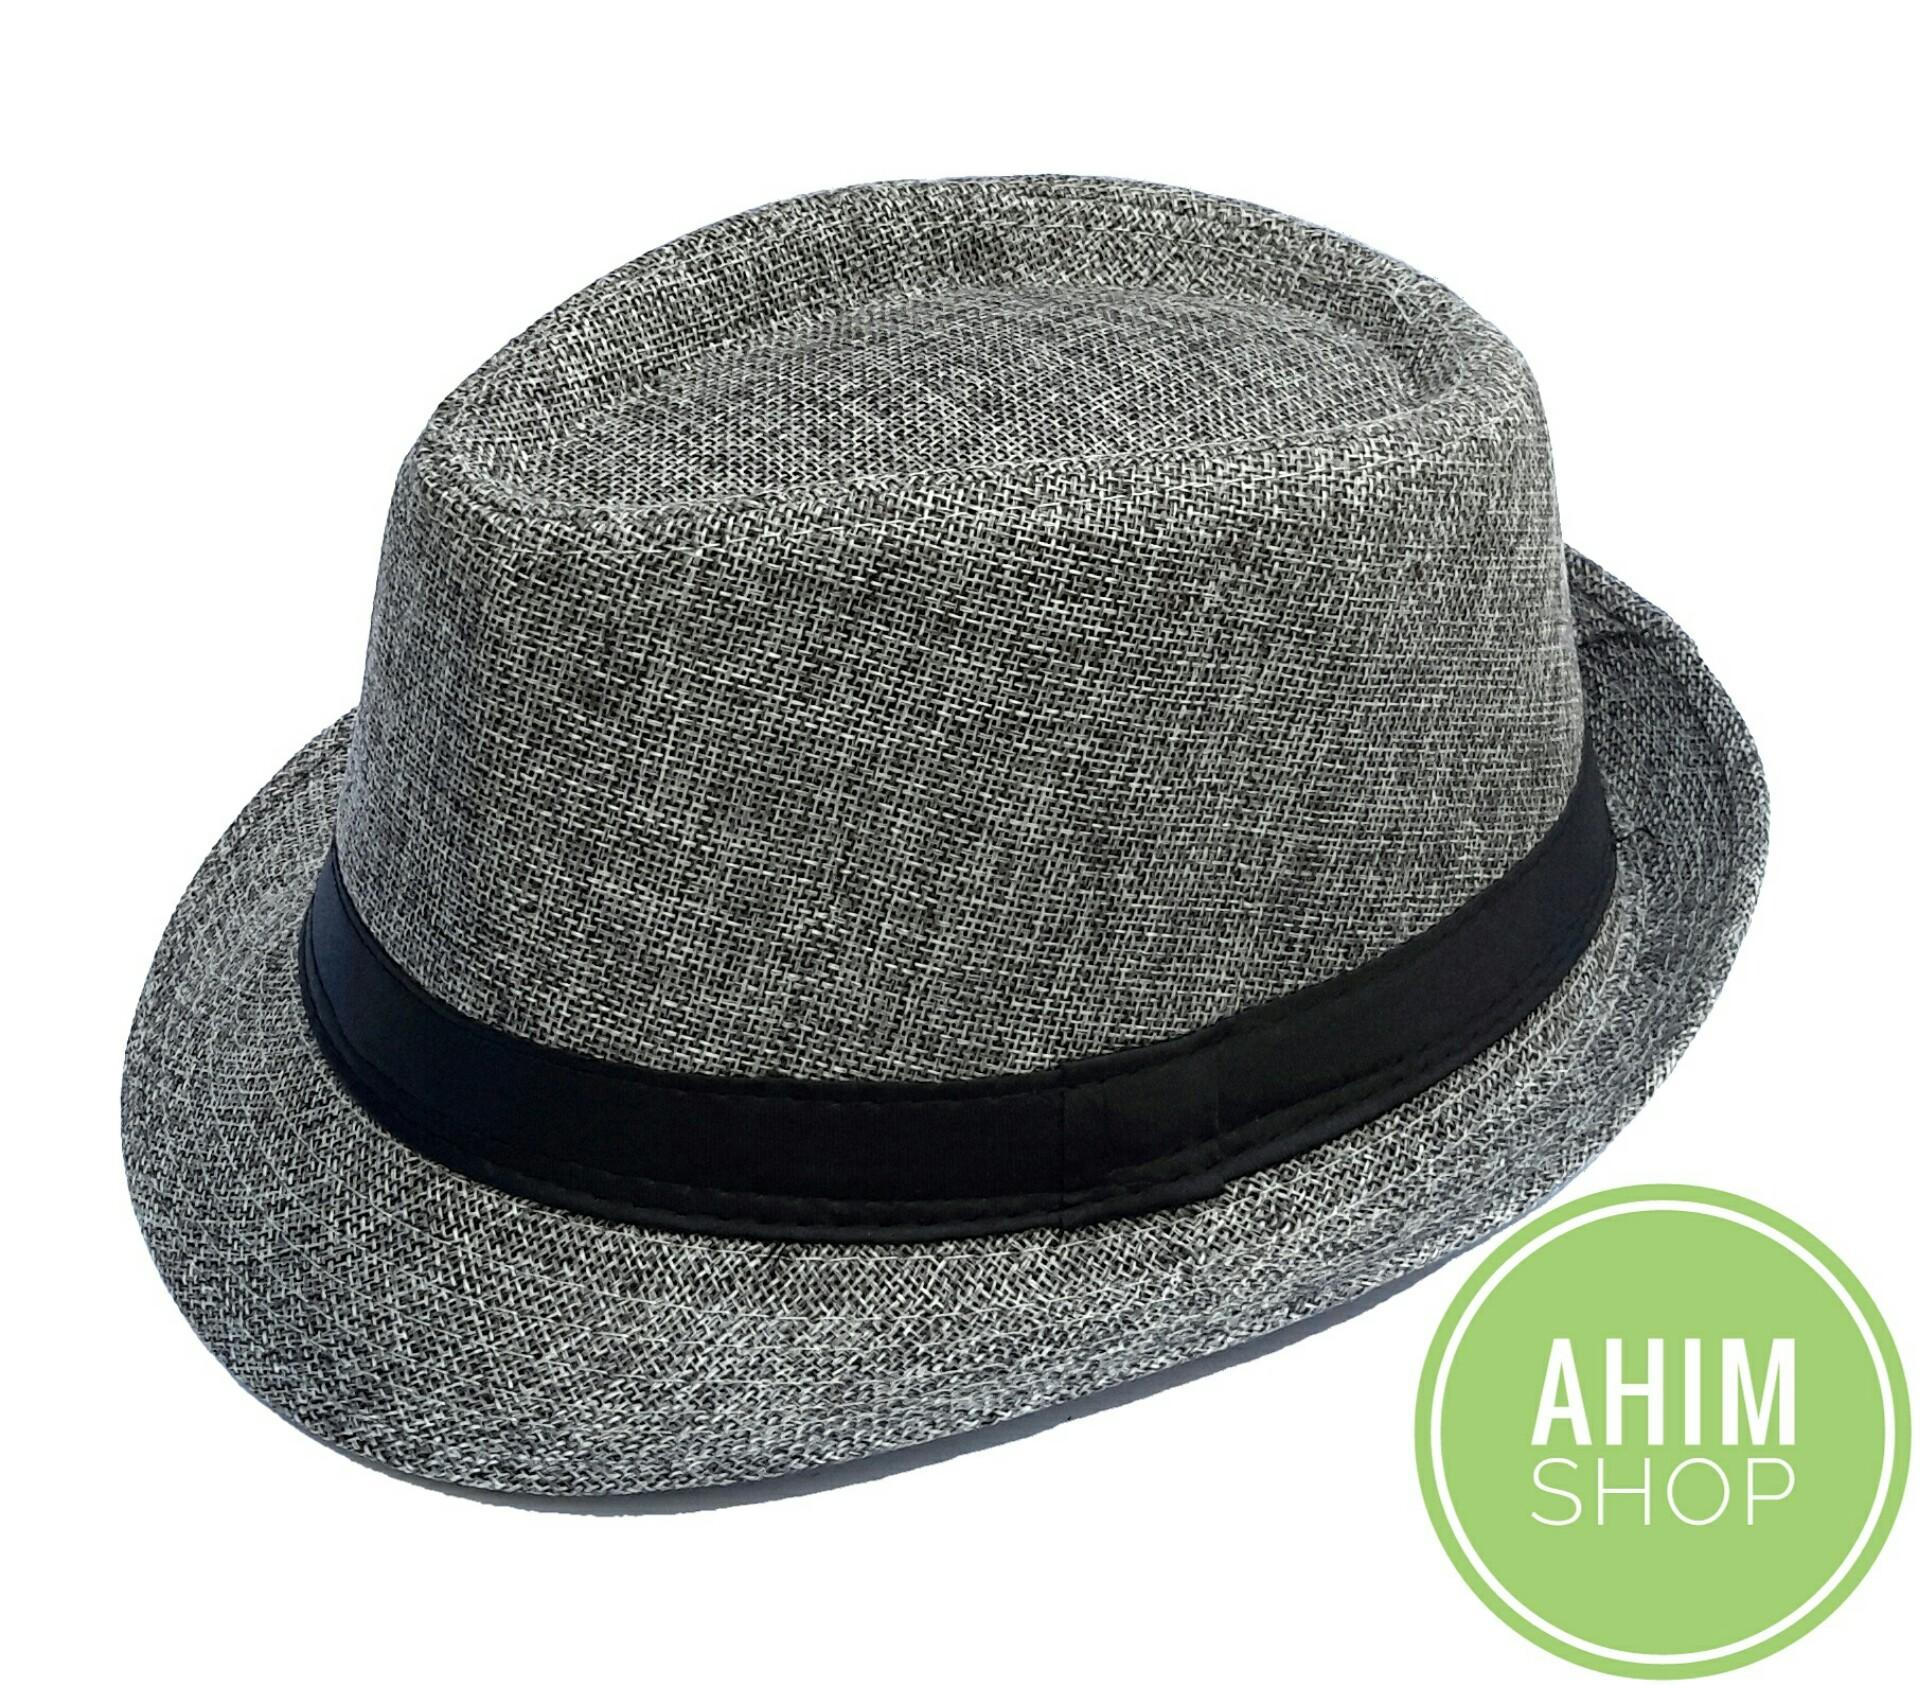 2522357cde9 TOPI JAZZ ANTI KUSUT Pria Wanita Tompi Fashion Fedora Panama Caplin Bowler  Hat by Ahim Shop